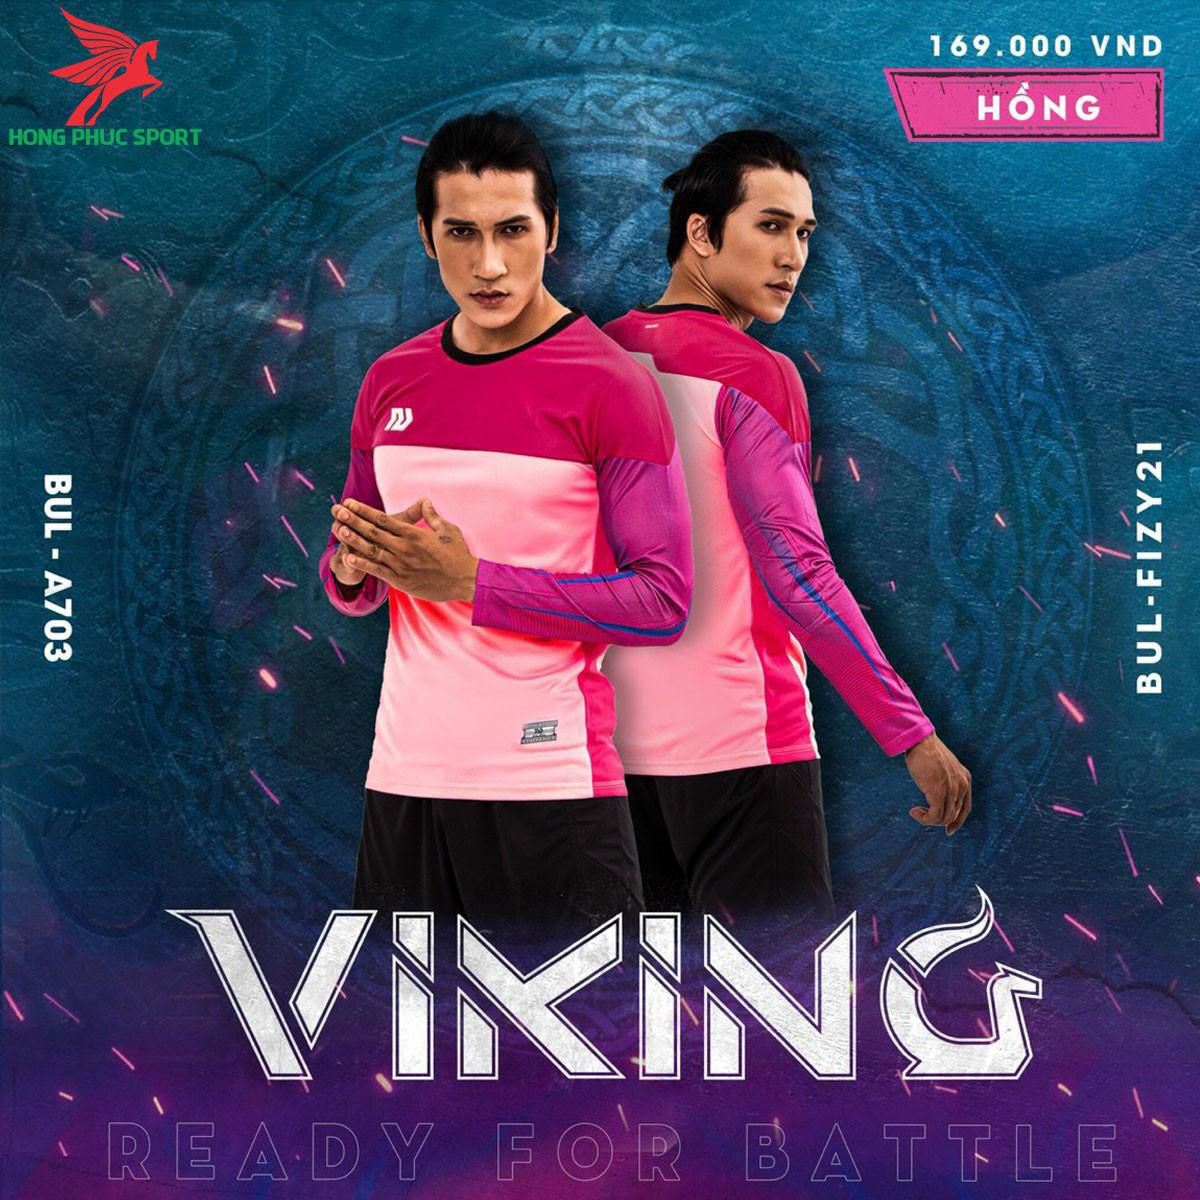 https://cdn.hongphucsport.com/unsafe/s4.shopbay.vn/files/285/ao-thu-mon-khong-logo-bulbal-viking-mau-hong-6051615209190.jpg